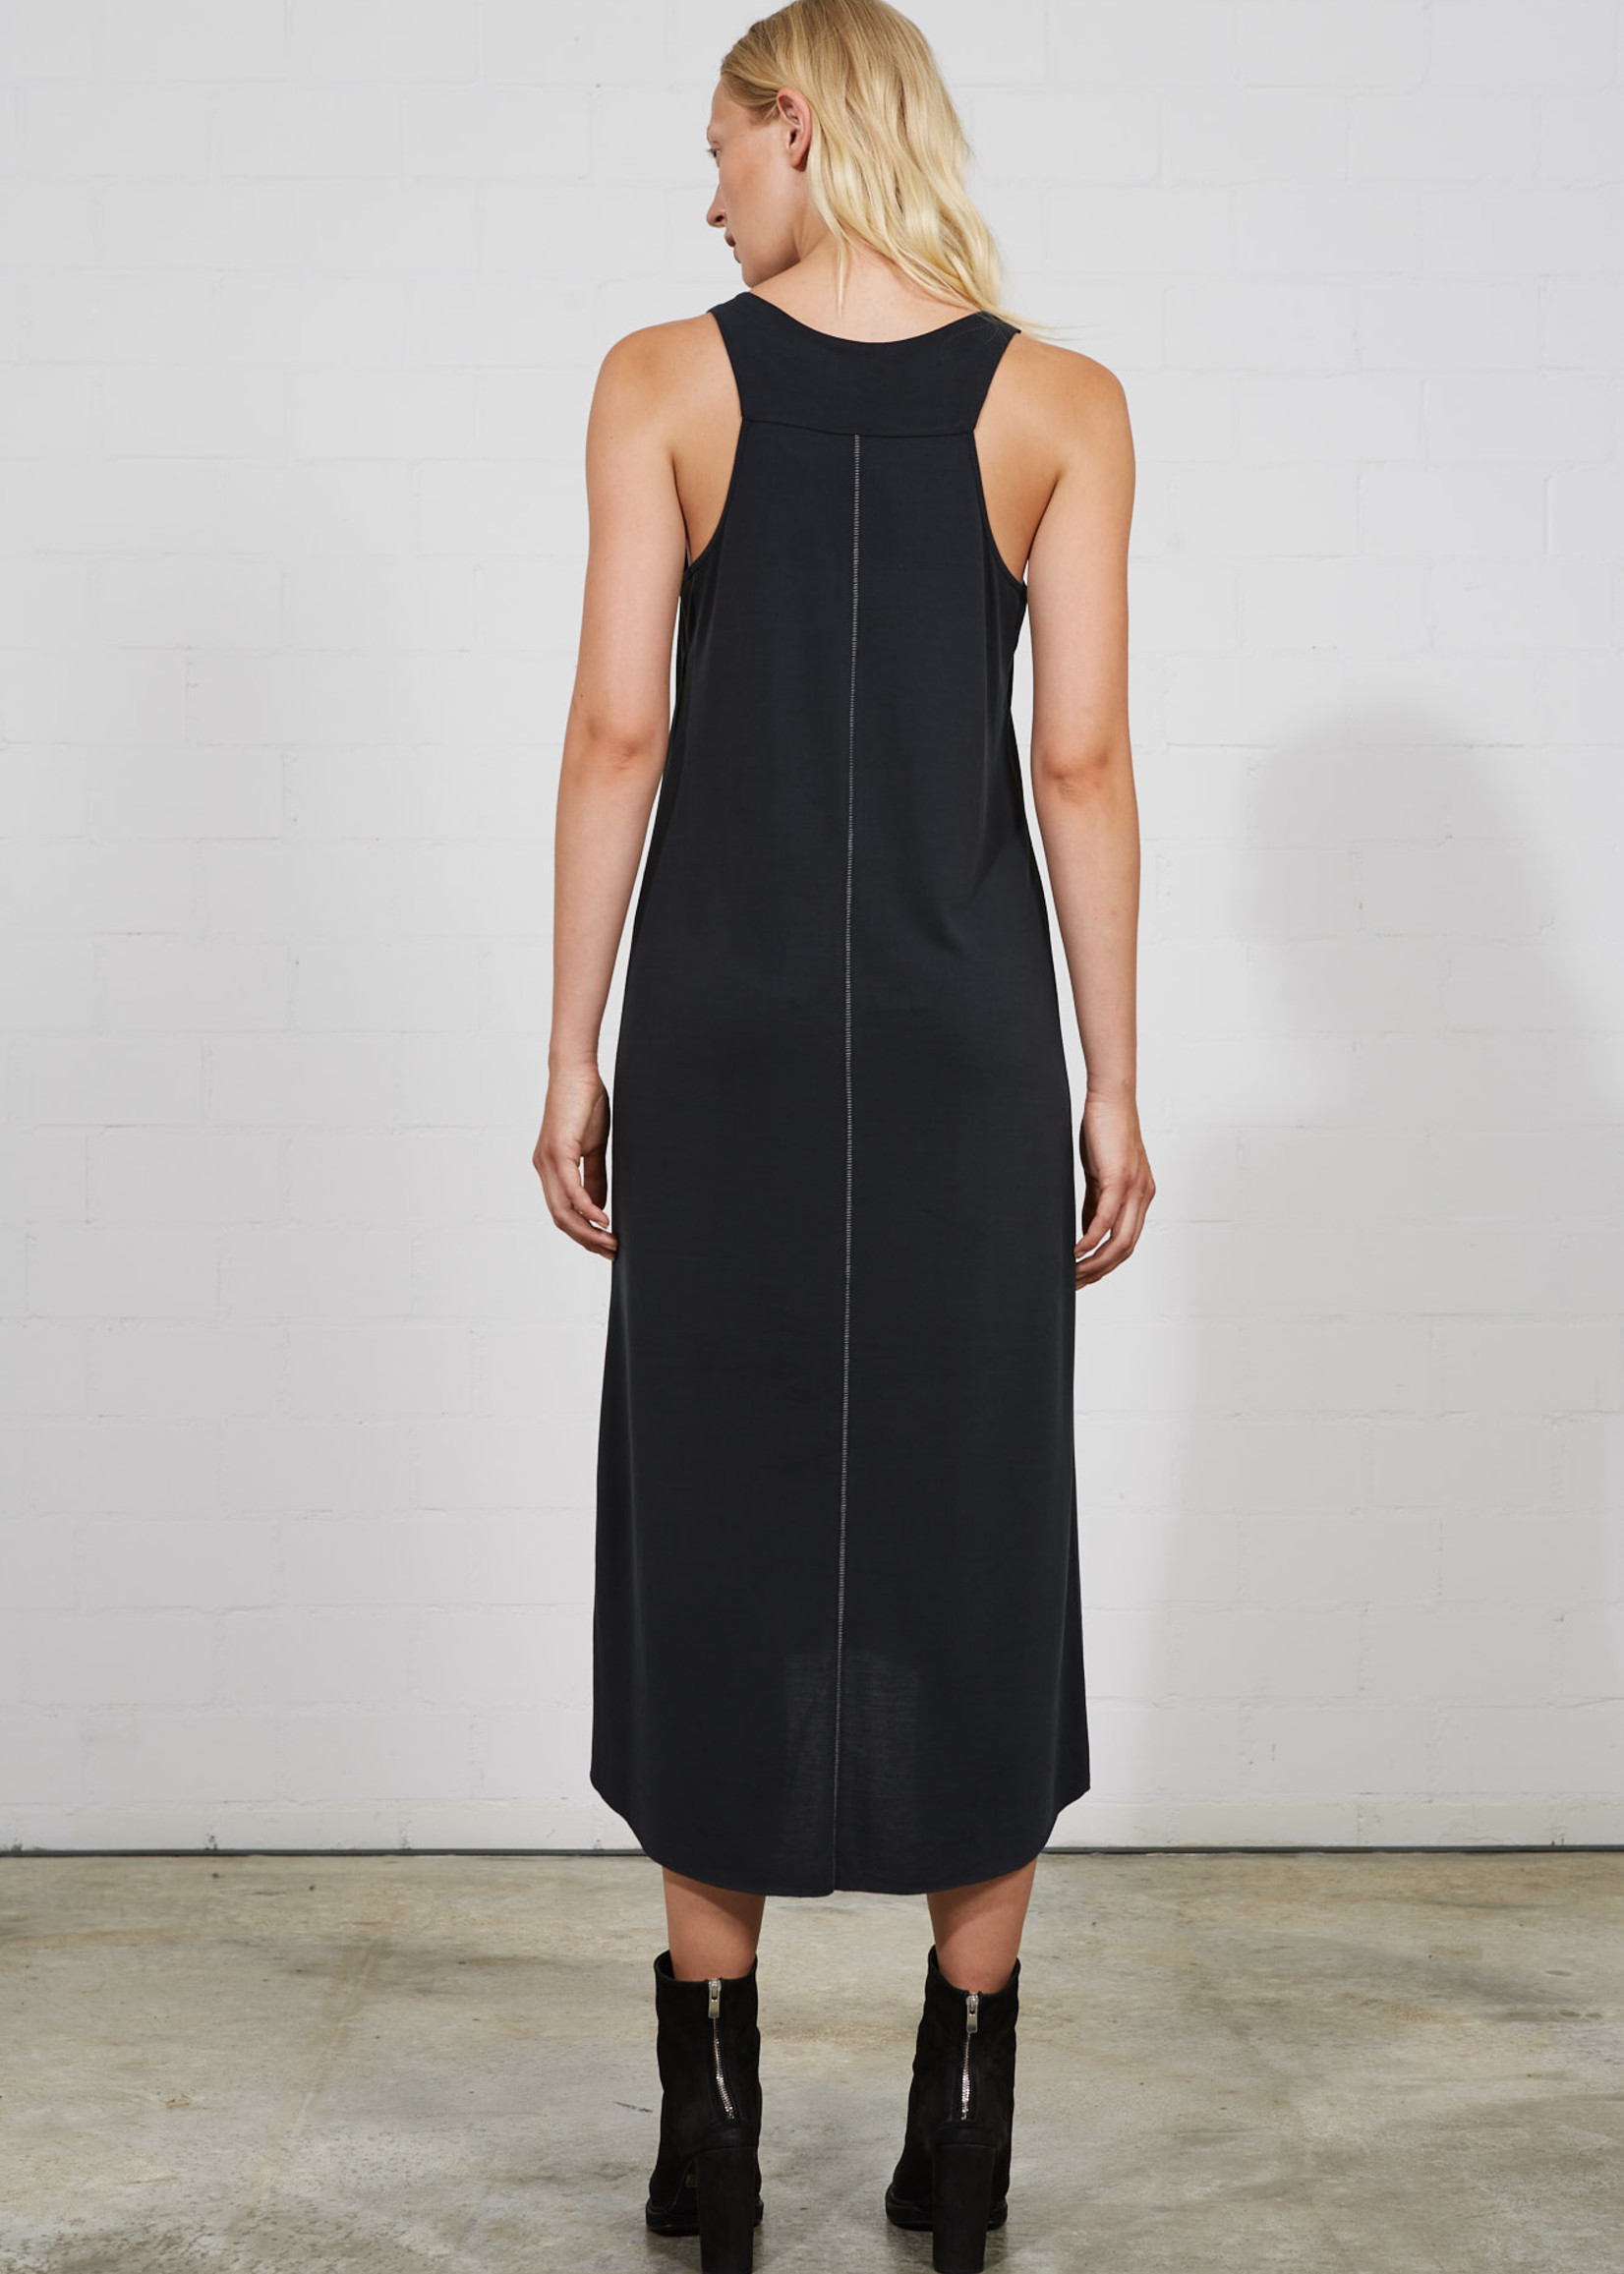 Thom krom Thom krom Thom/Krom dress Black